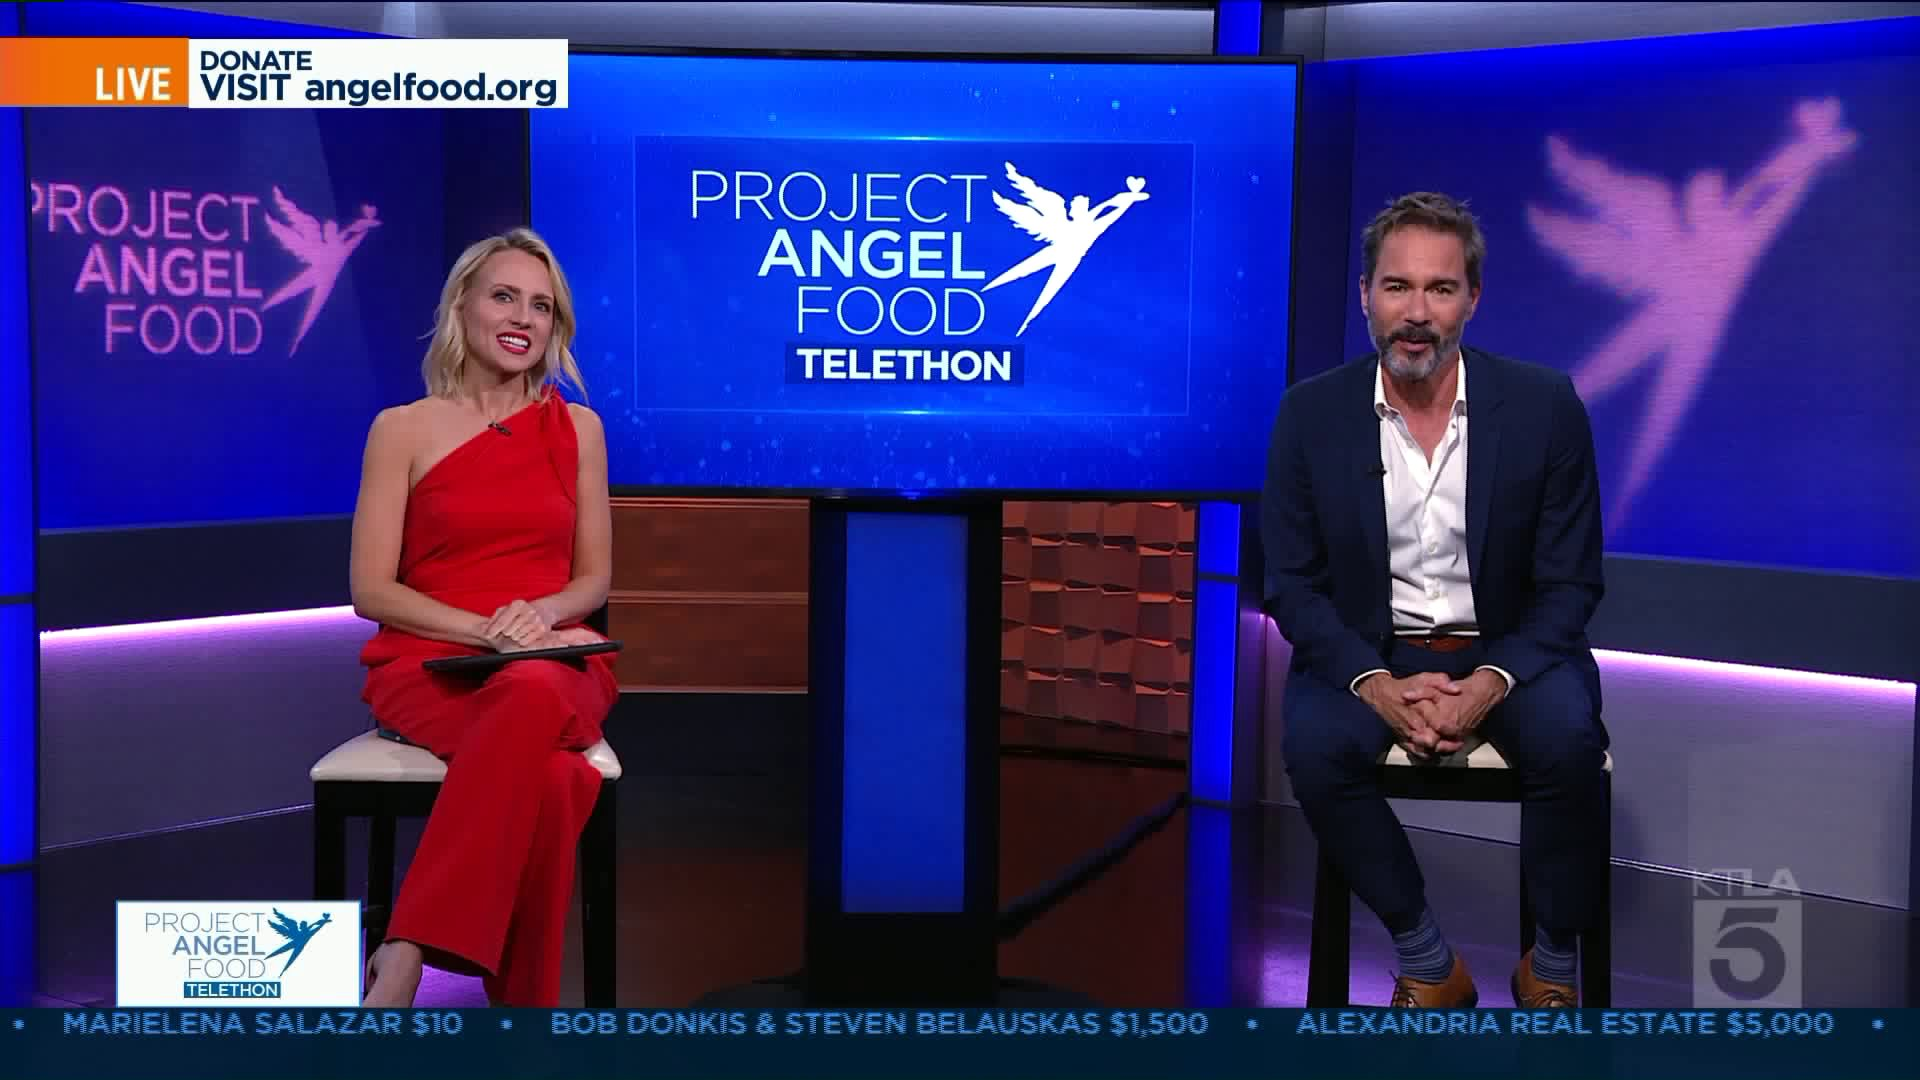 KTLA's Jessica Holmes and actor Eric McCormack hosted the Project Angel Food Telethon on June 27, 2020. (KTLA)